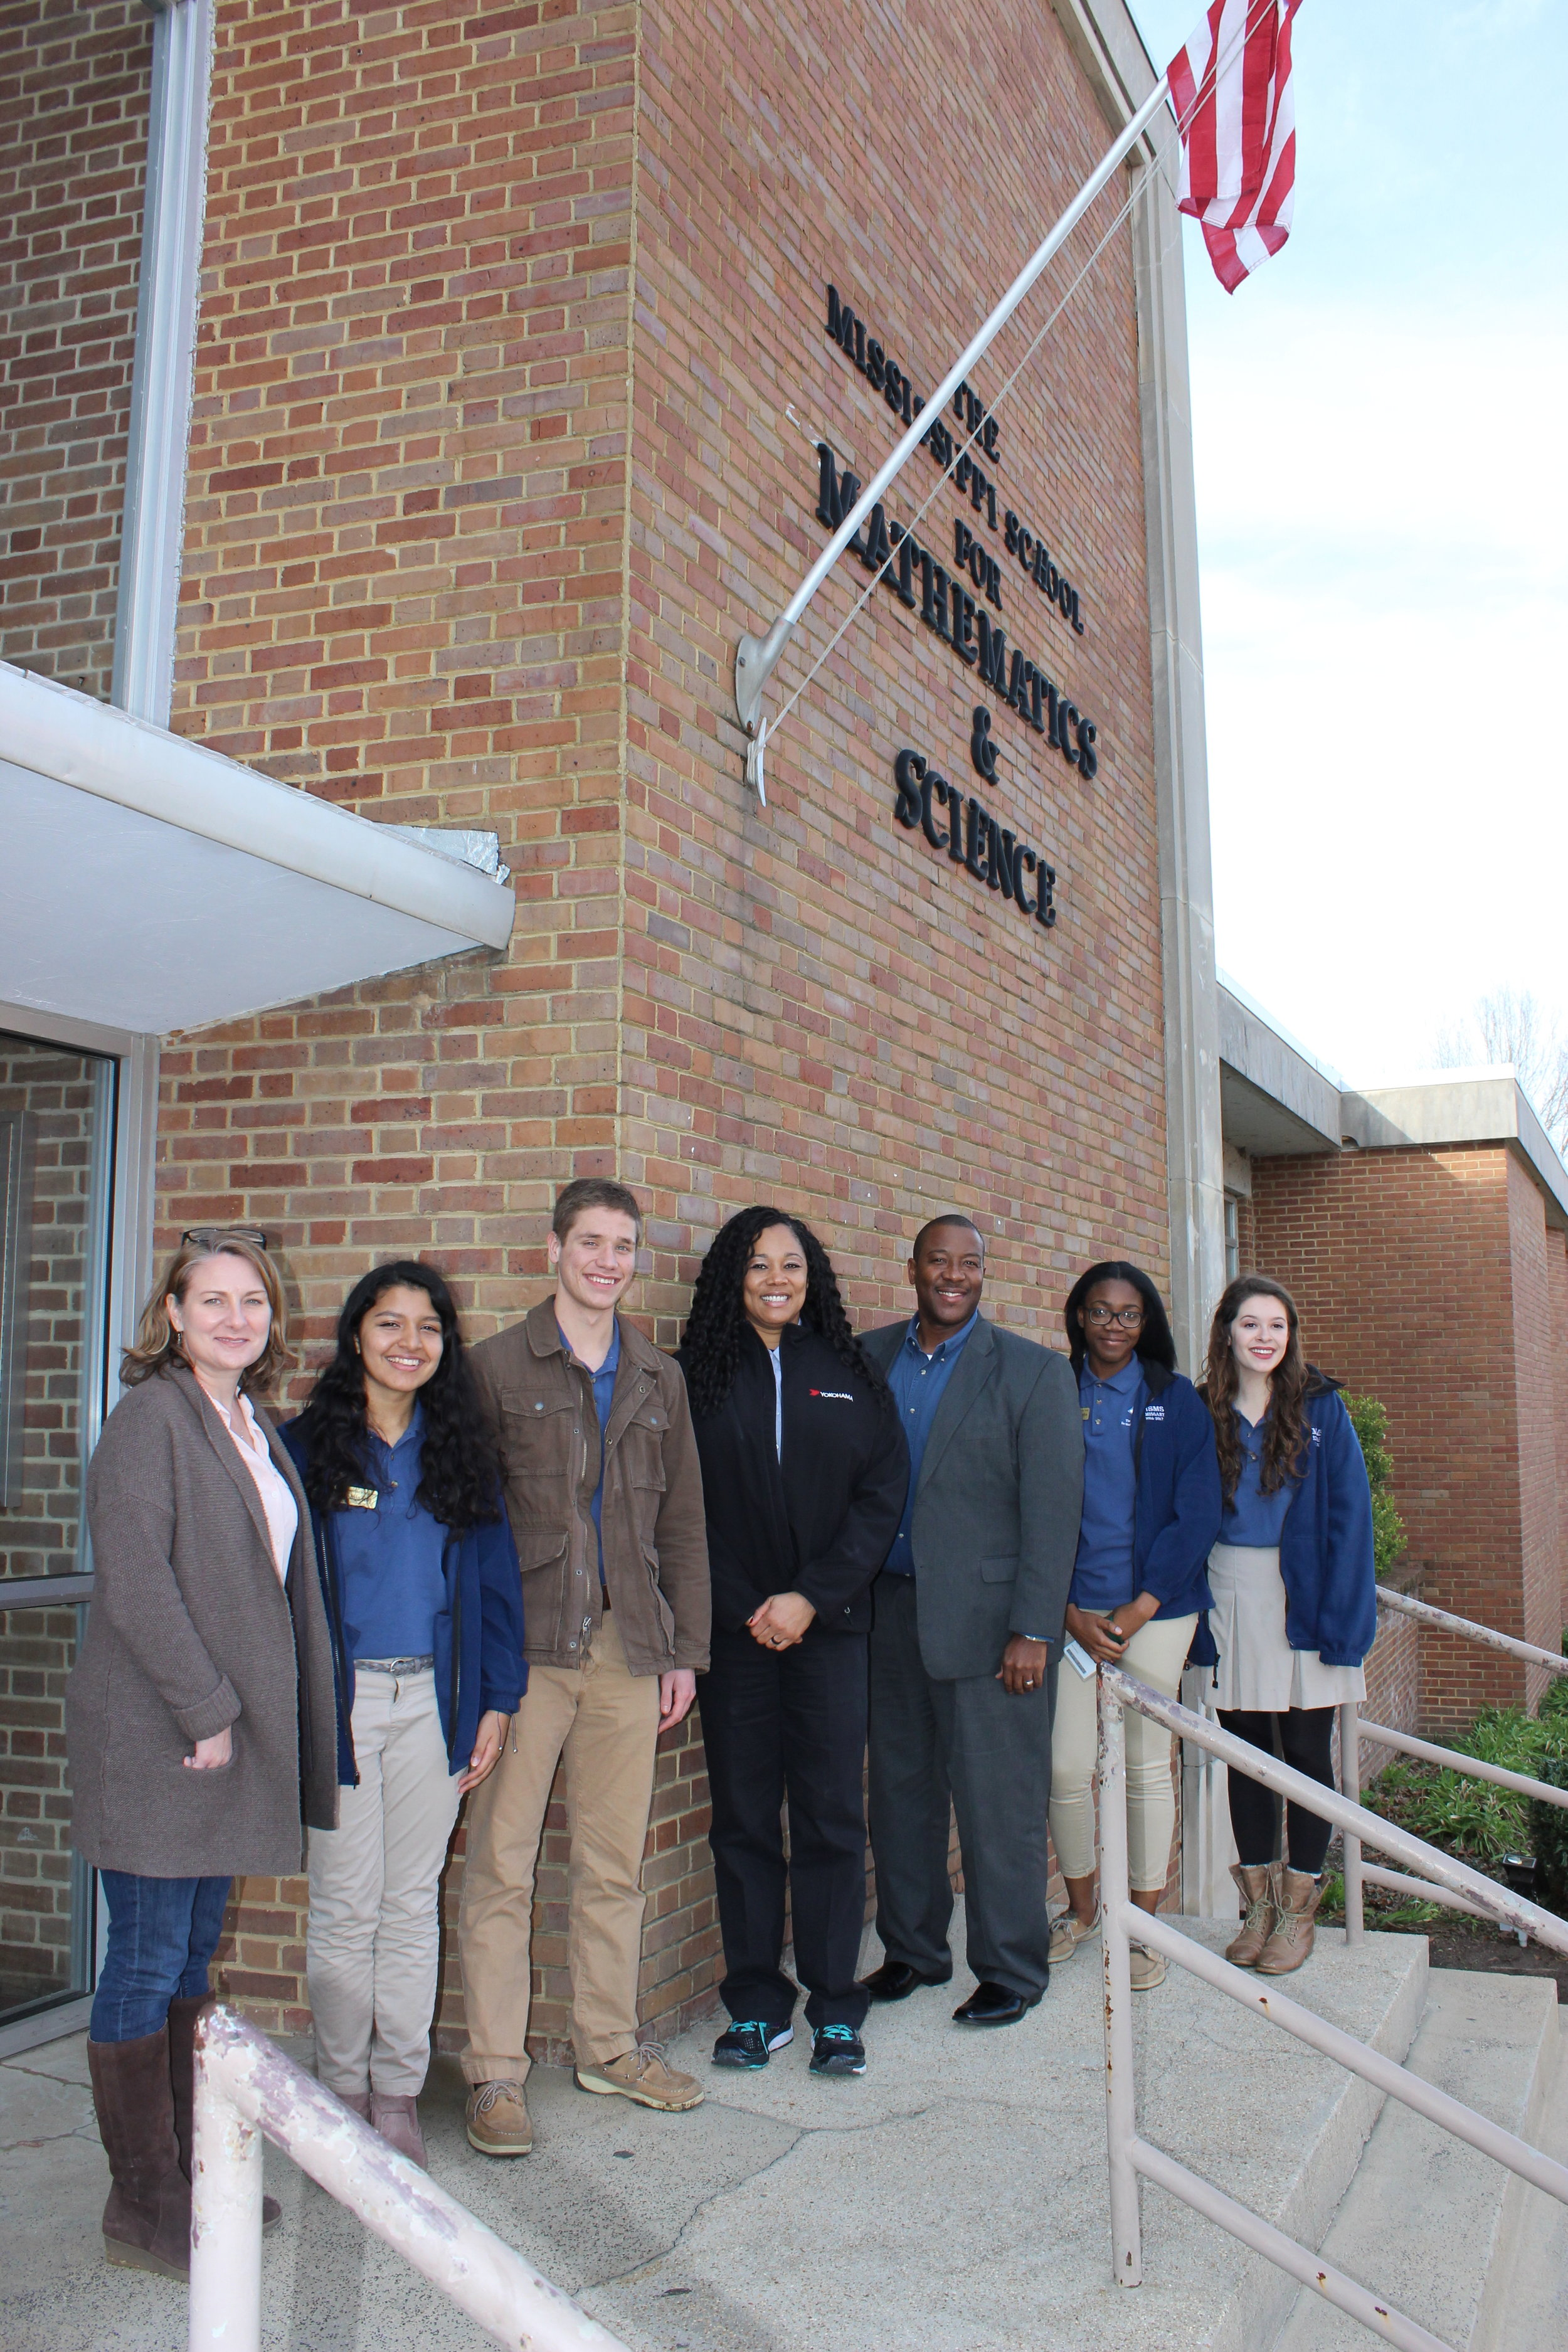 From left: Dr. Heather Hanna, Wrishija Roy, Braeden Foldenhaur, Kebebe Wilson, Dr. Germain McConnell, Chinwe Udemgba, and Claudia Vial.